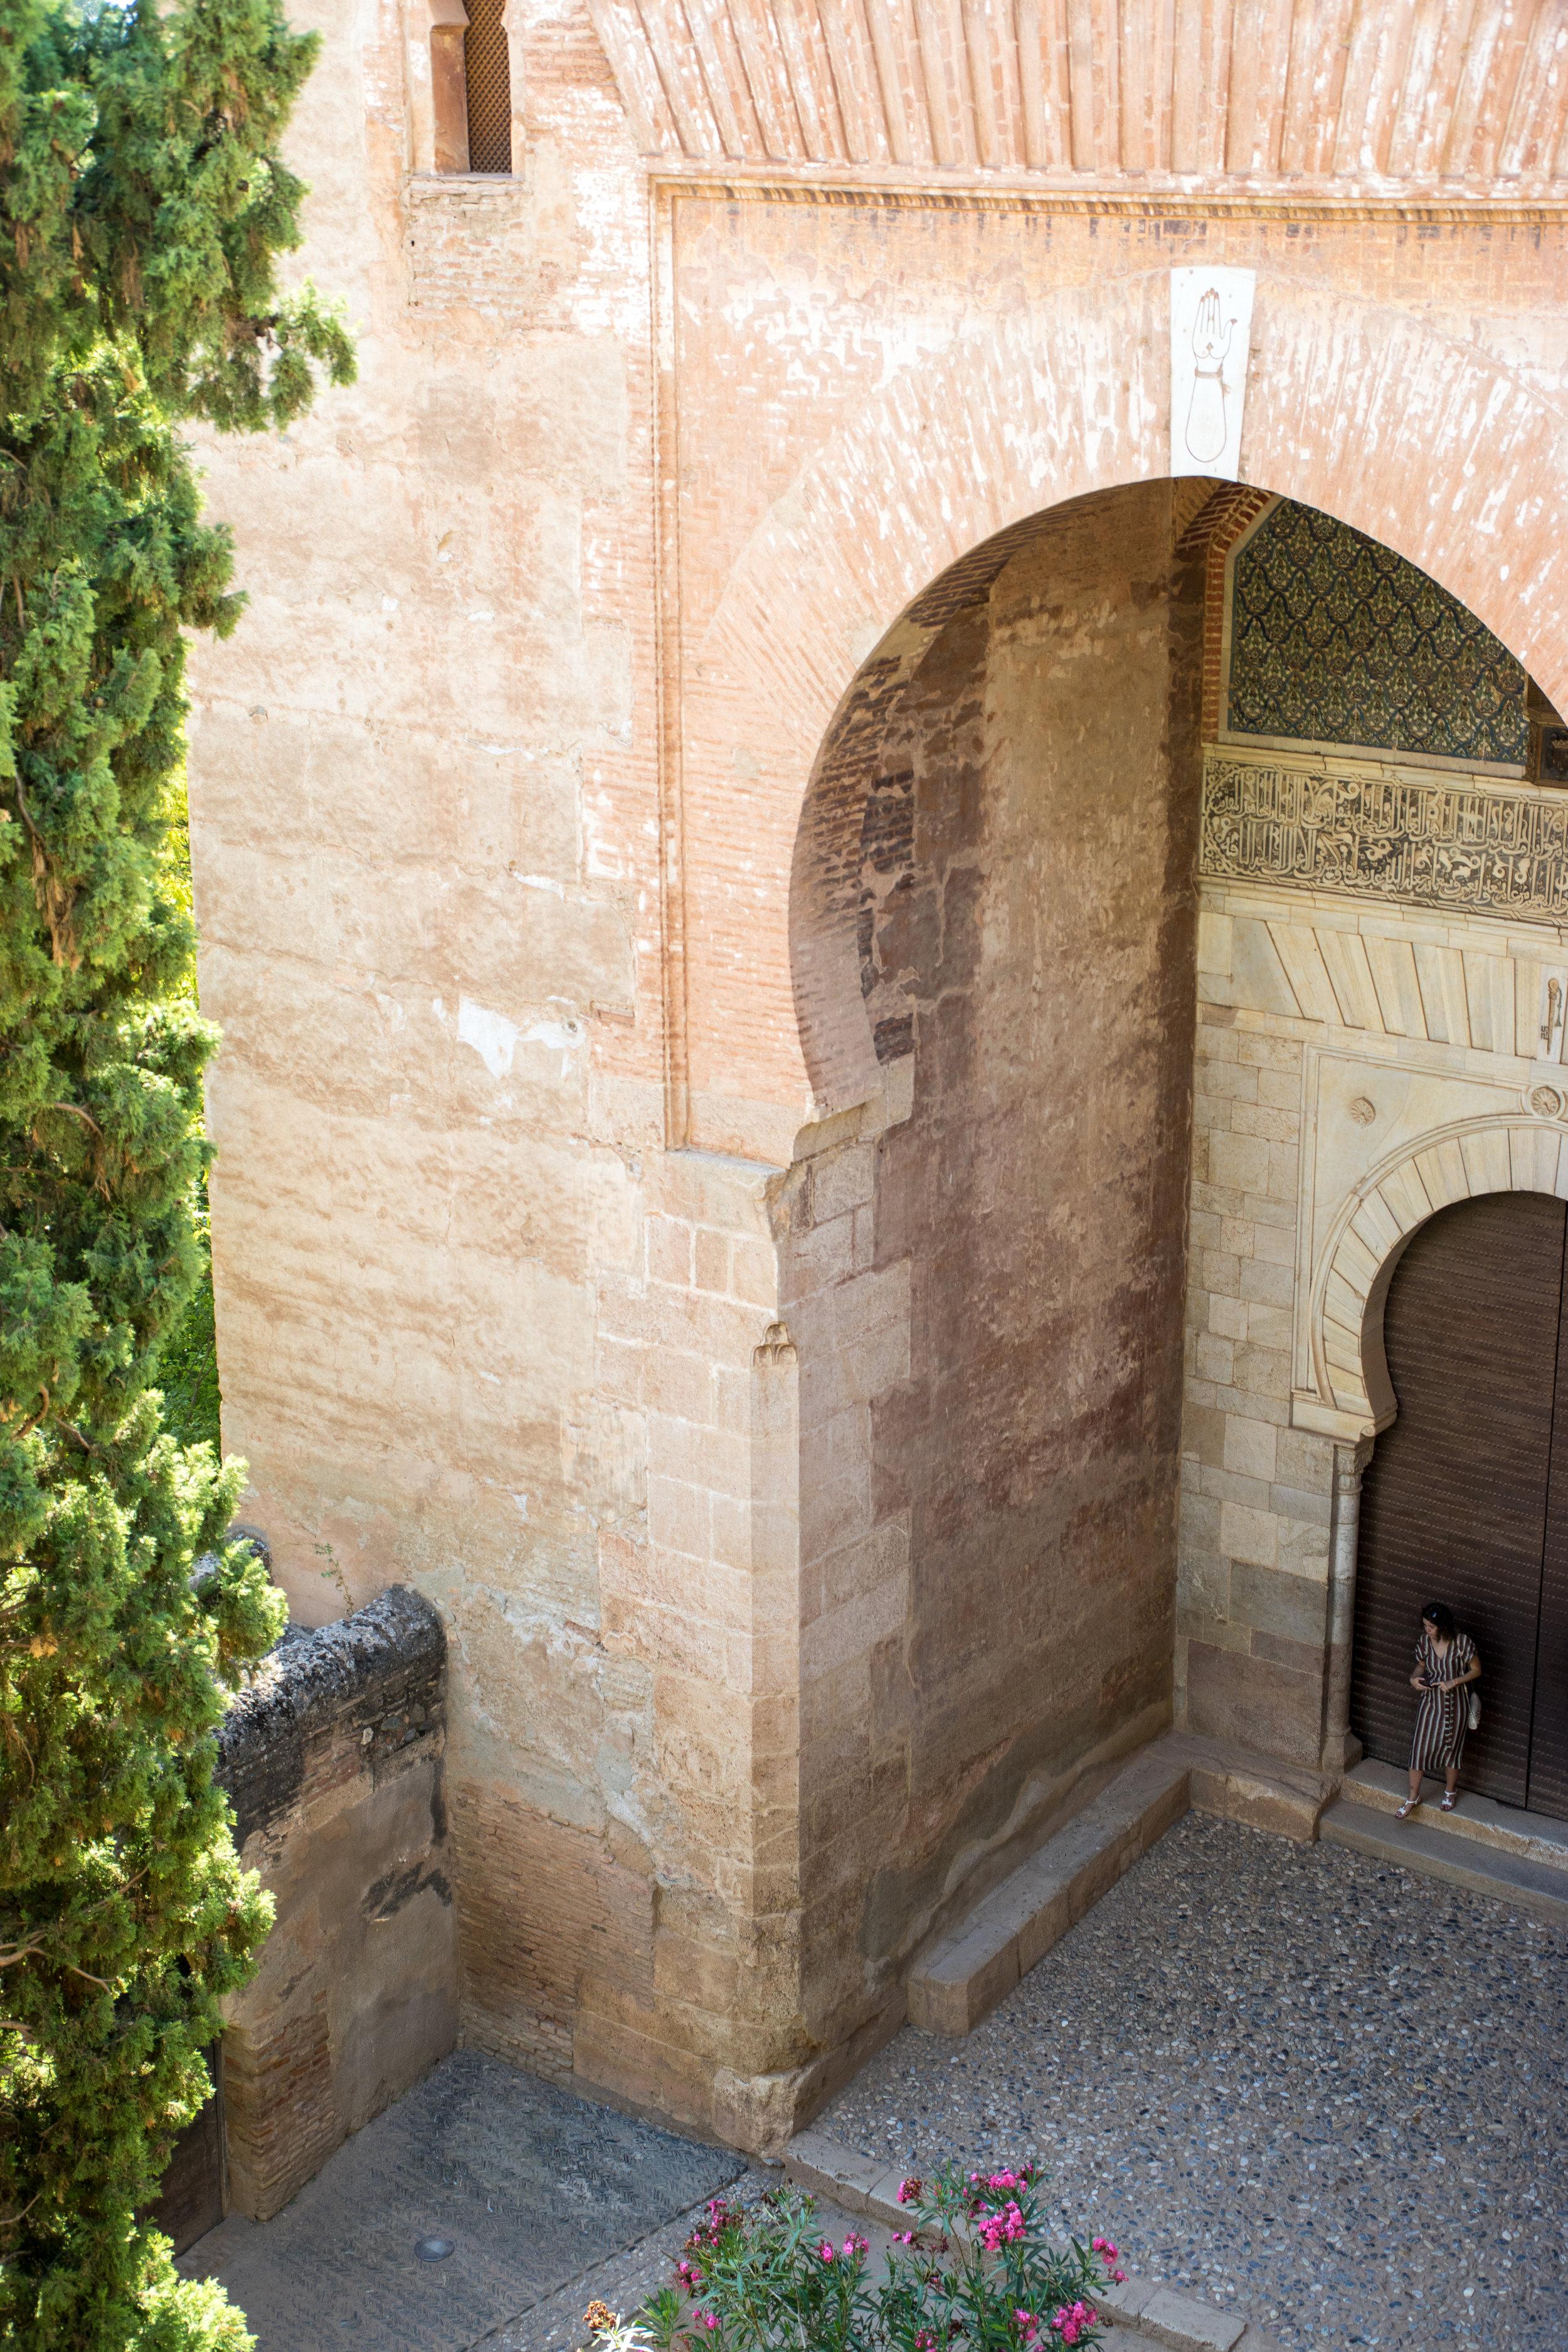 Wanderer - Granada, Spain